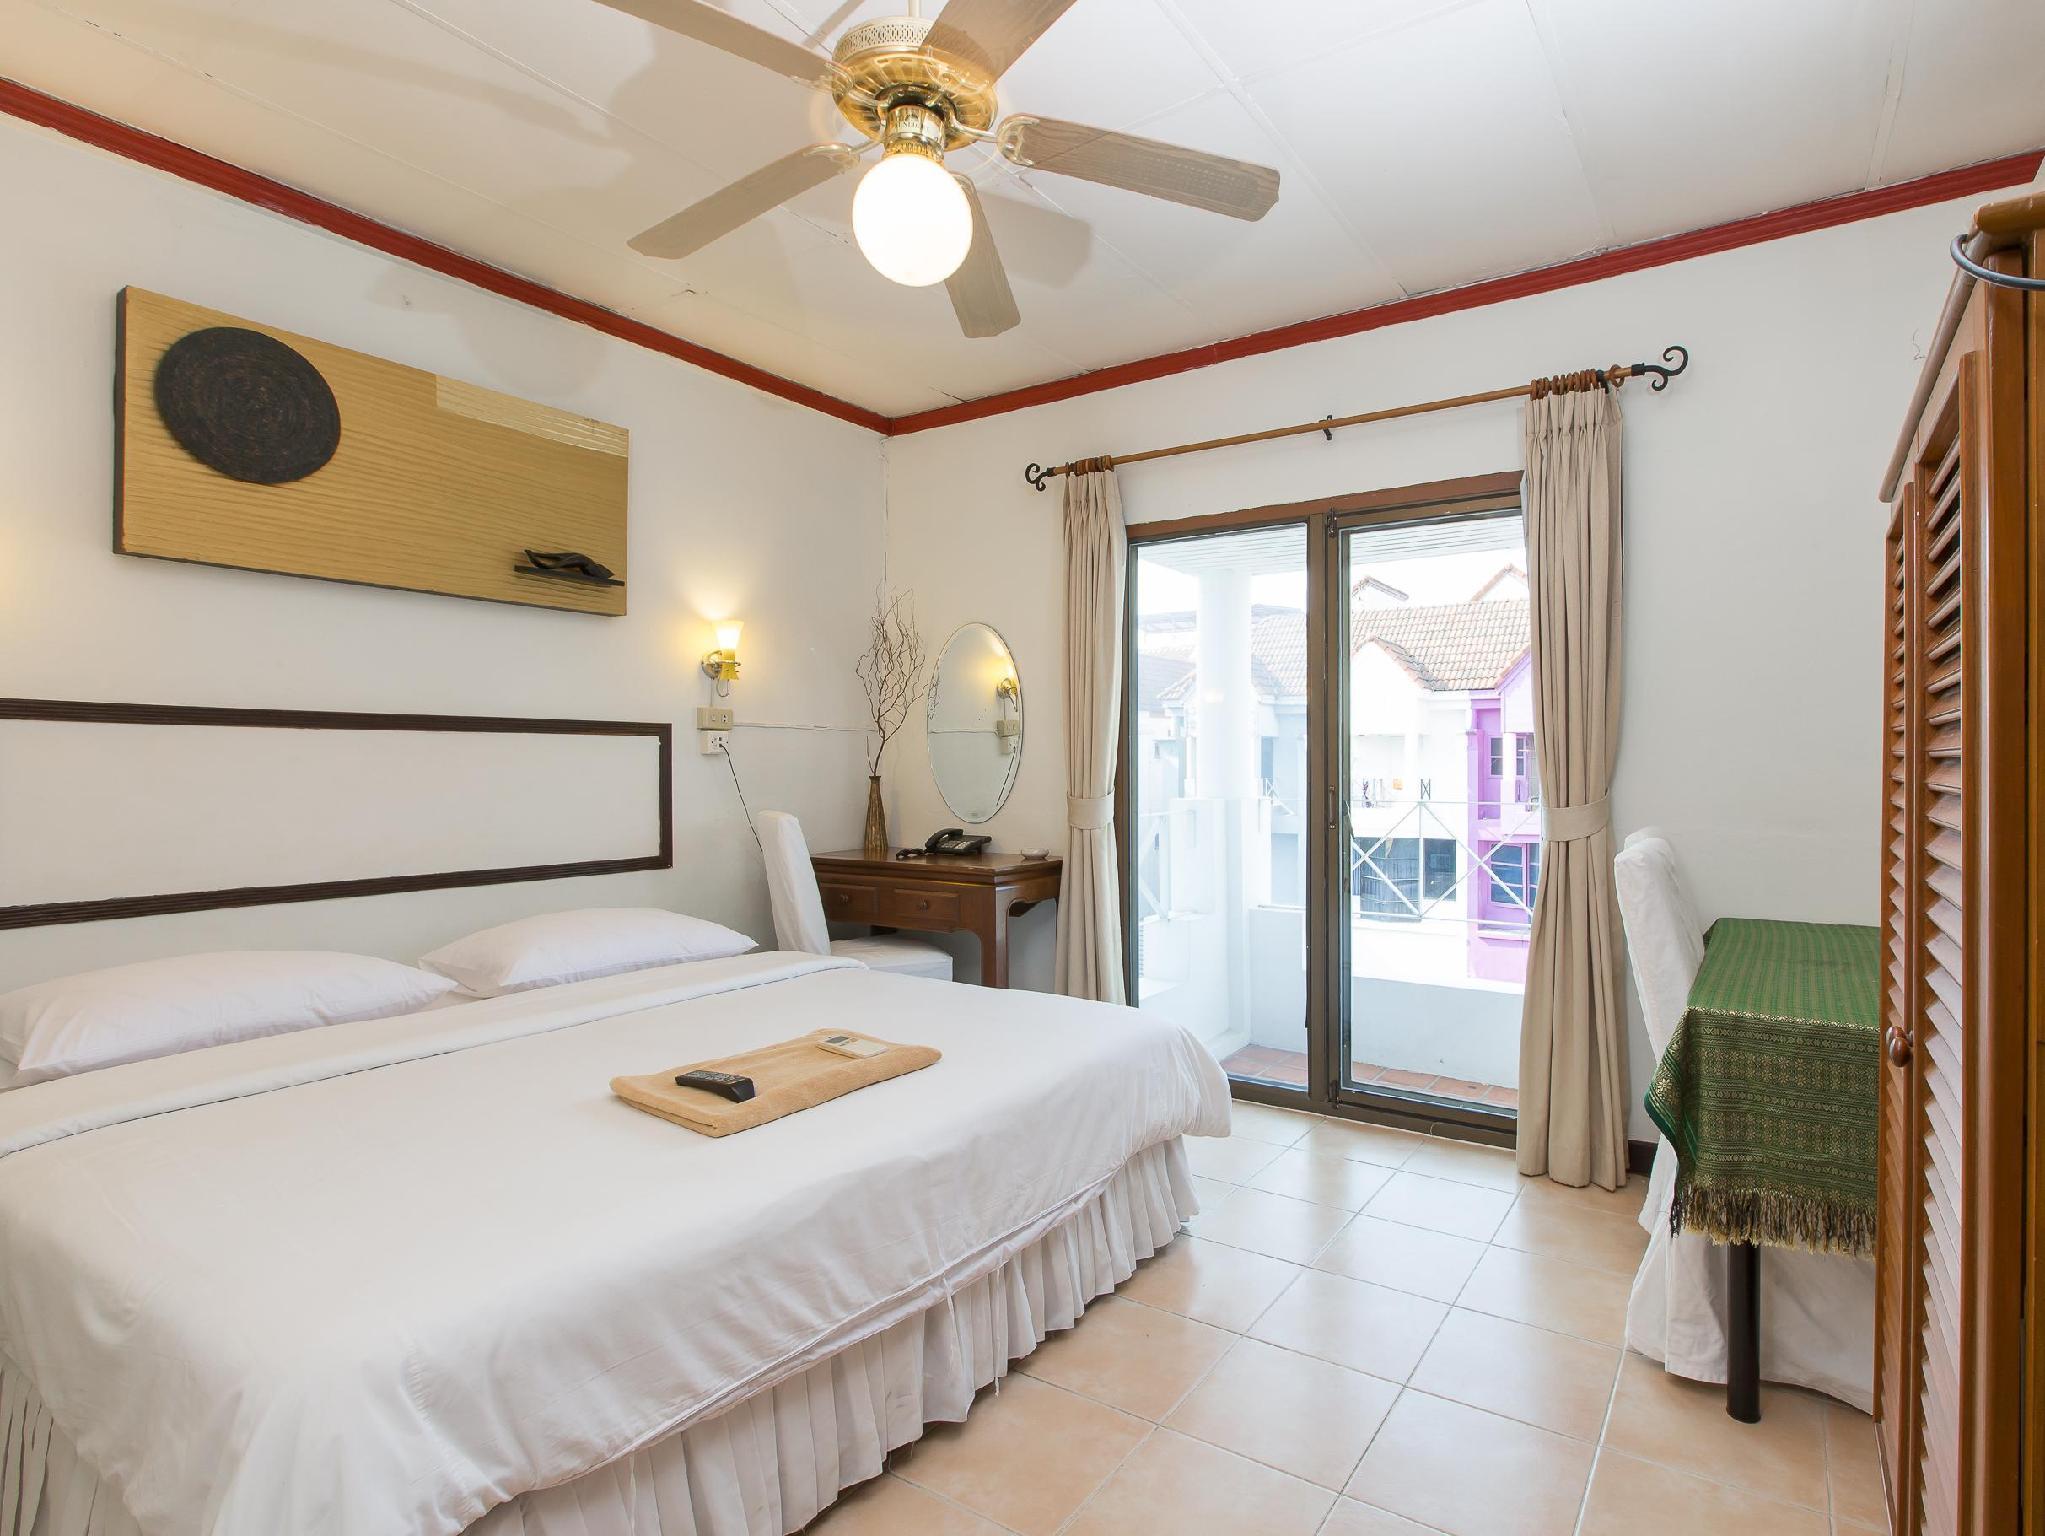 Connect Guesthouse, Pulau Phuket